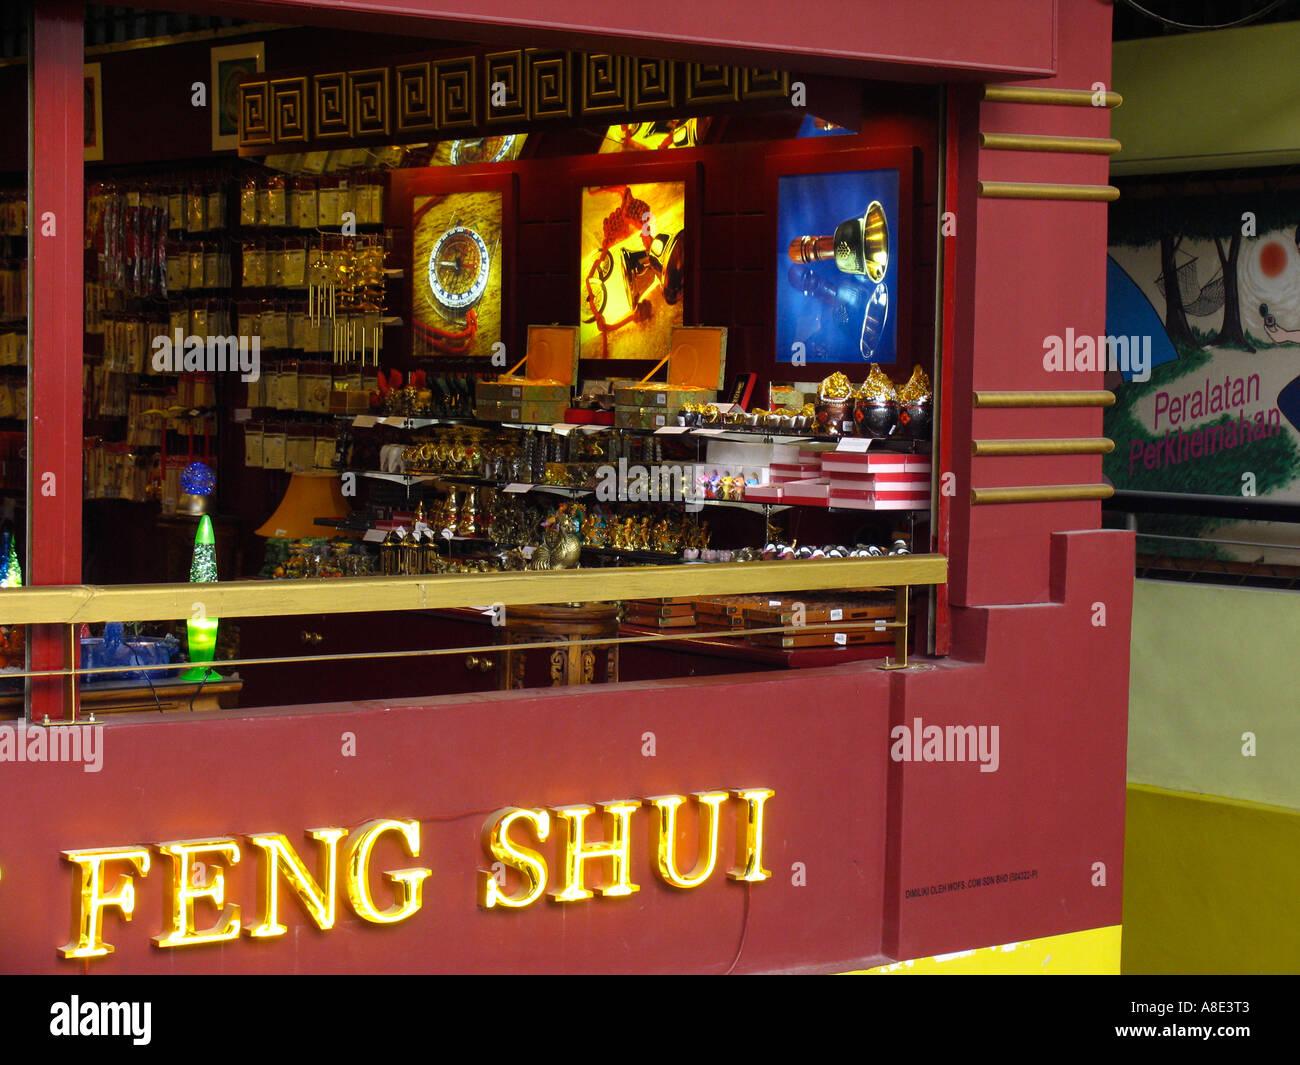 Farben Feng Shui Stock Photos Farben Feng Shui Stock Images Alamy